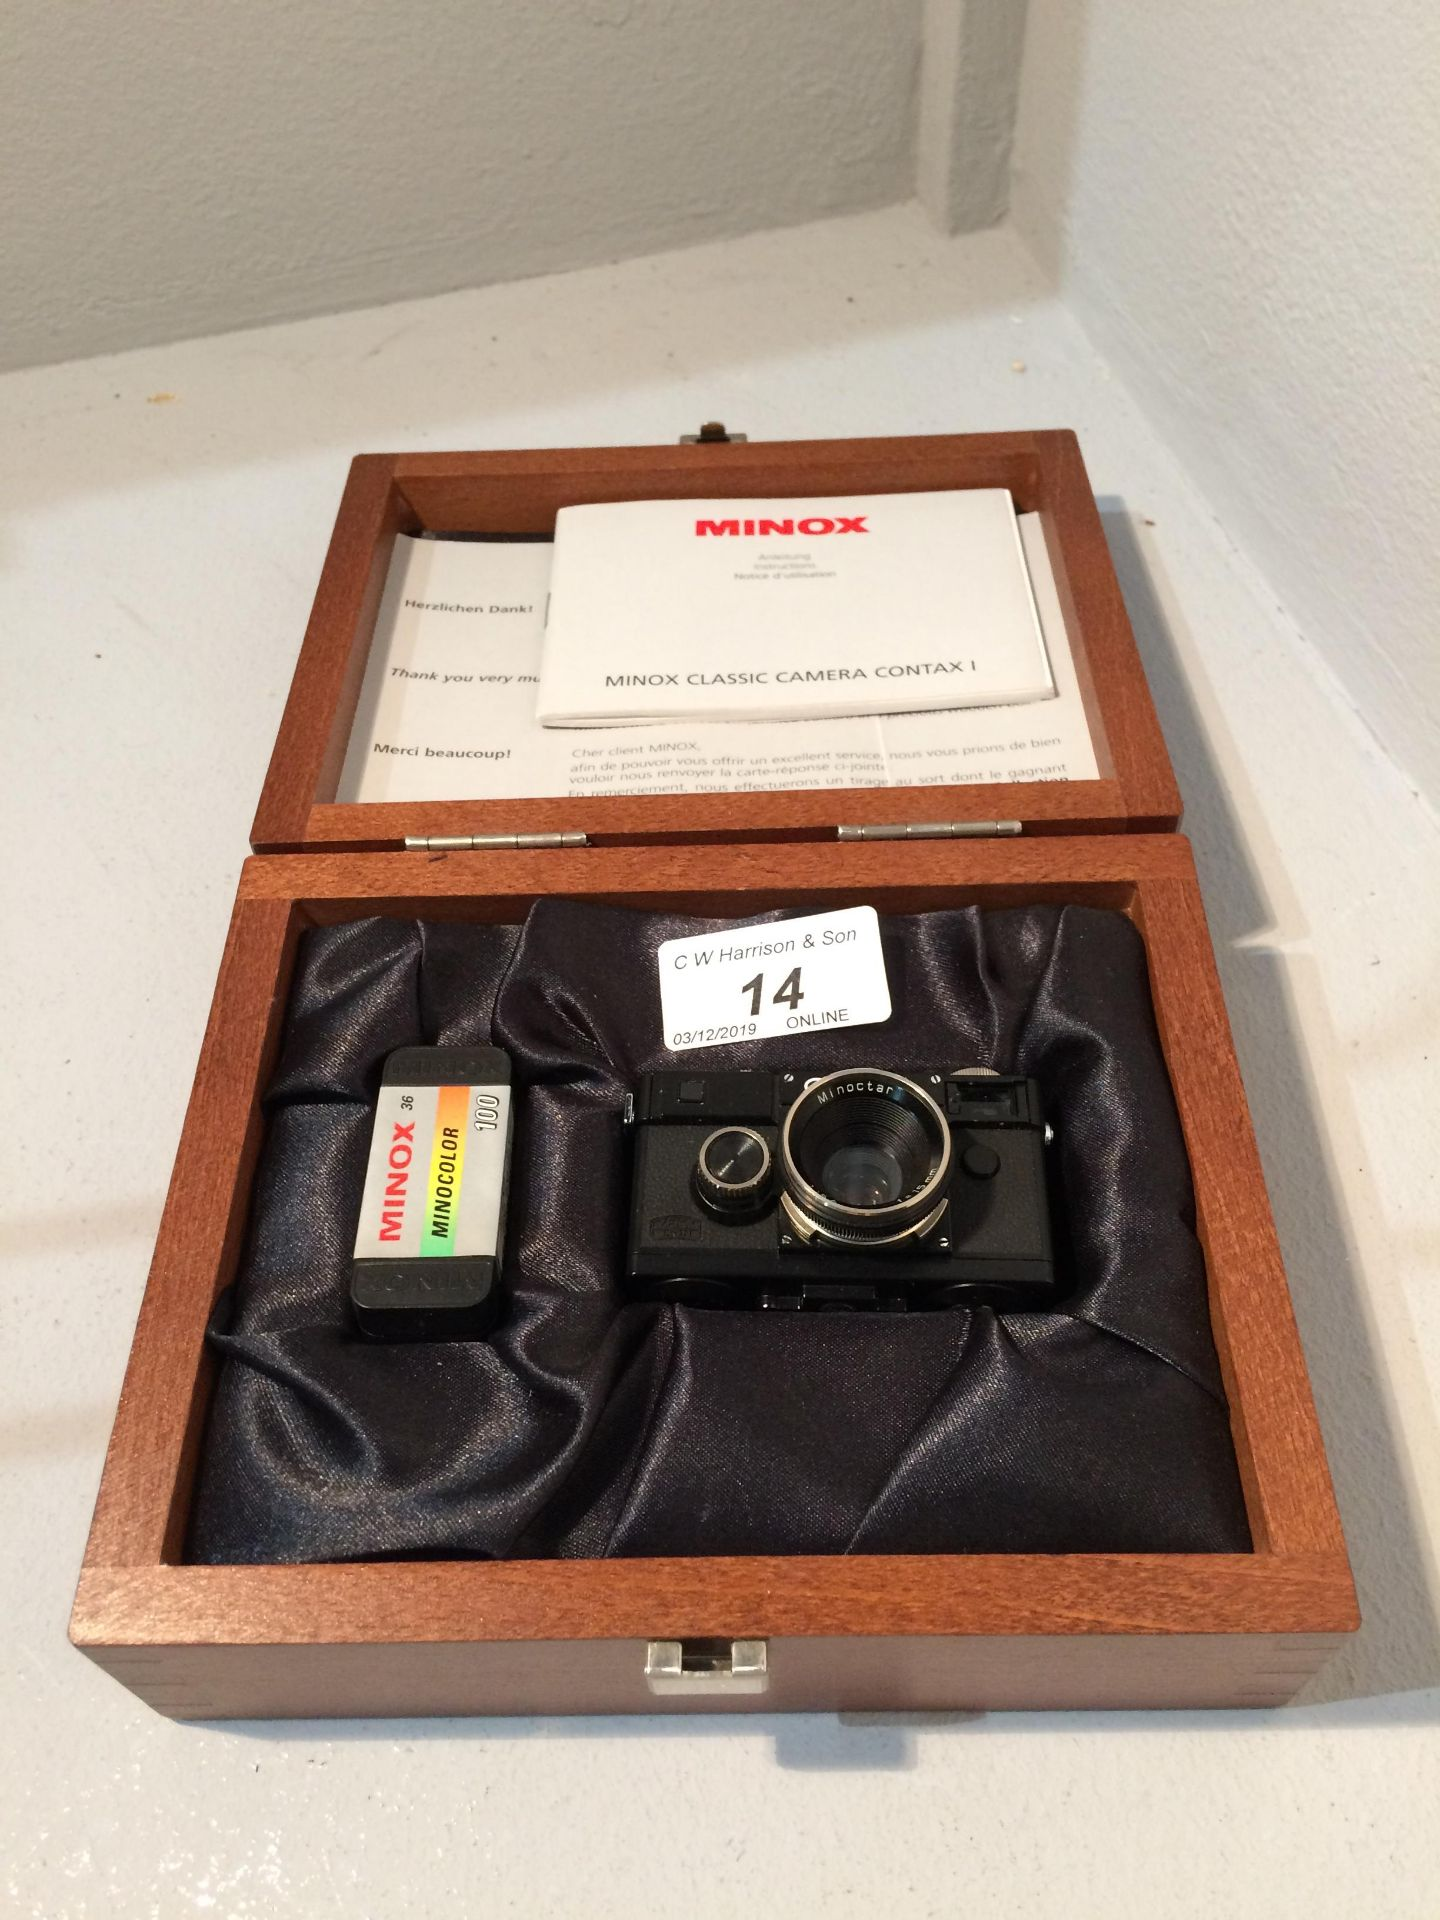 Lot 14 - Minox Camera Collections miniature Contax KM0295 camera, Minoctar 1..5.